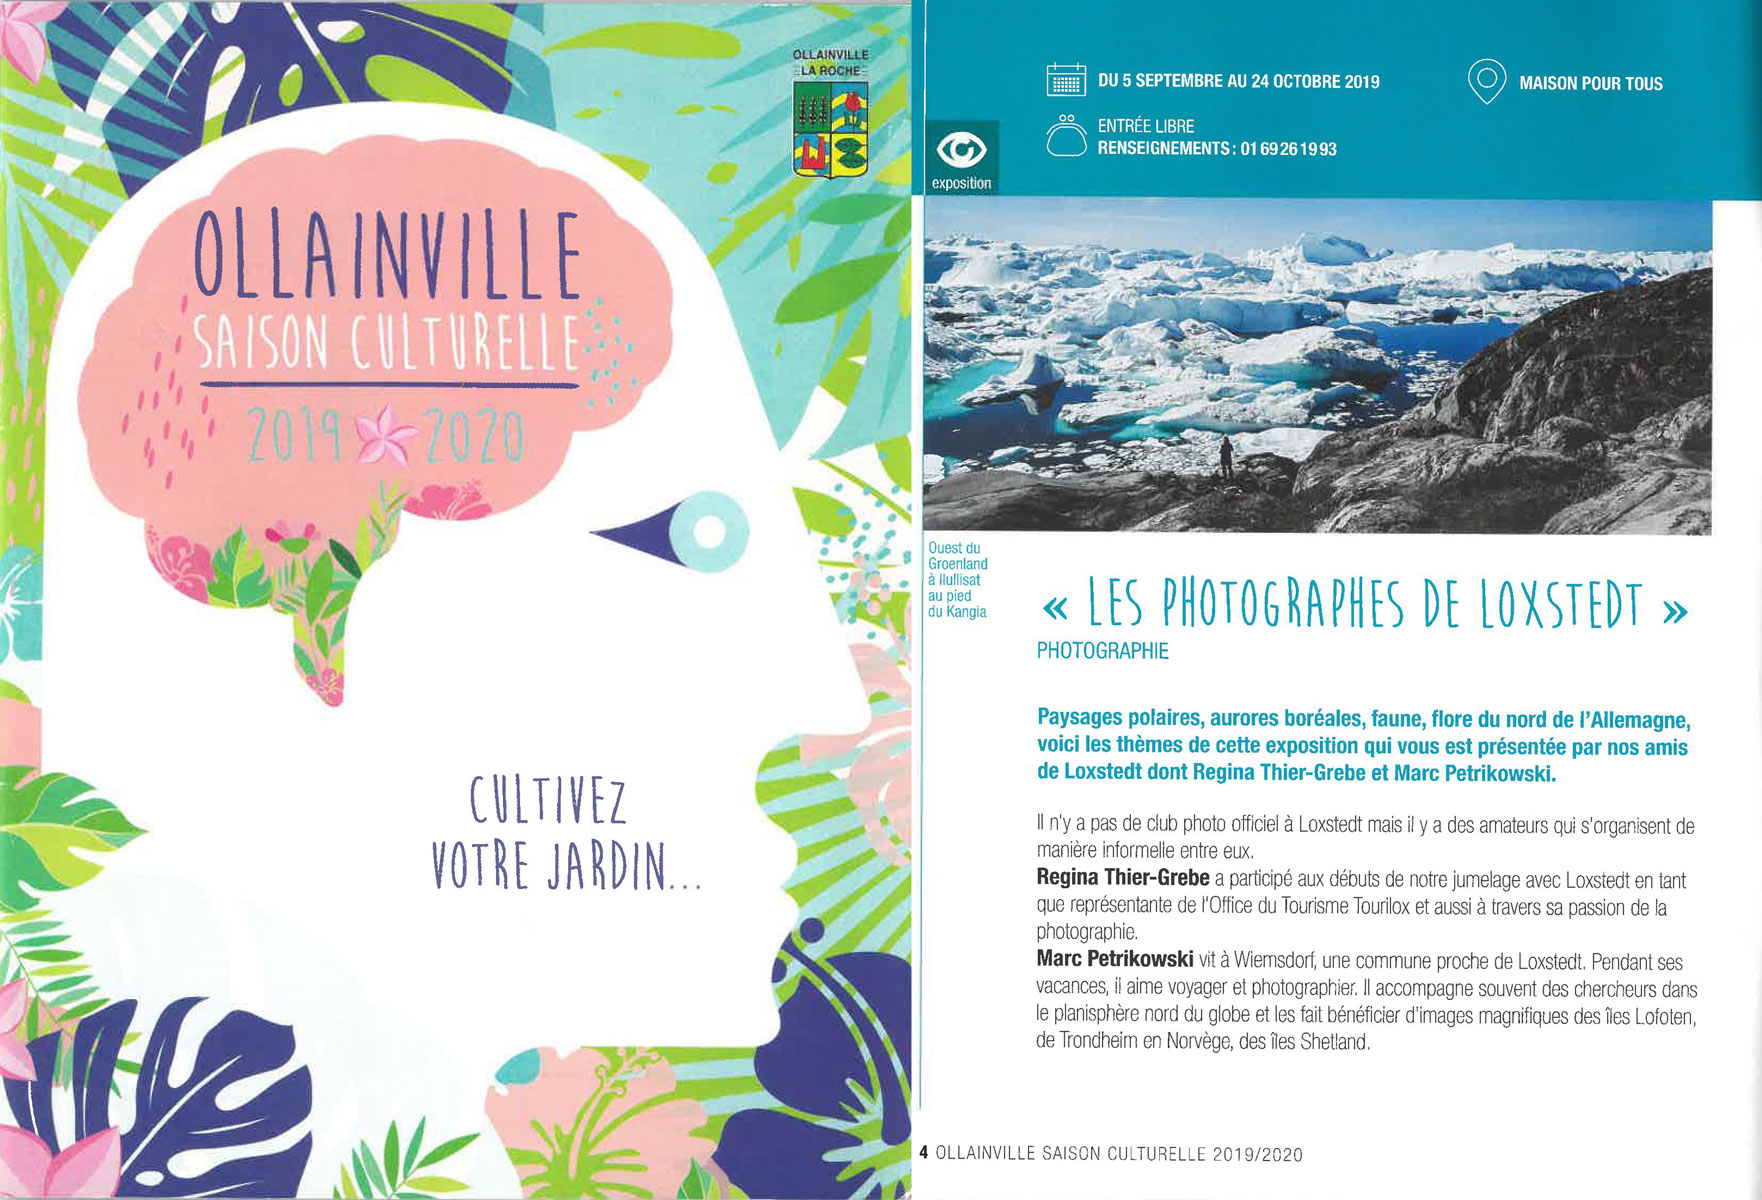 Ollainville Ausstellungs-Ankündigung im Kulturanzeiger